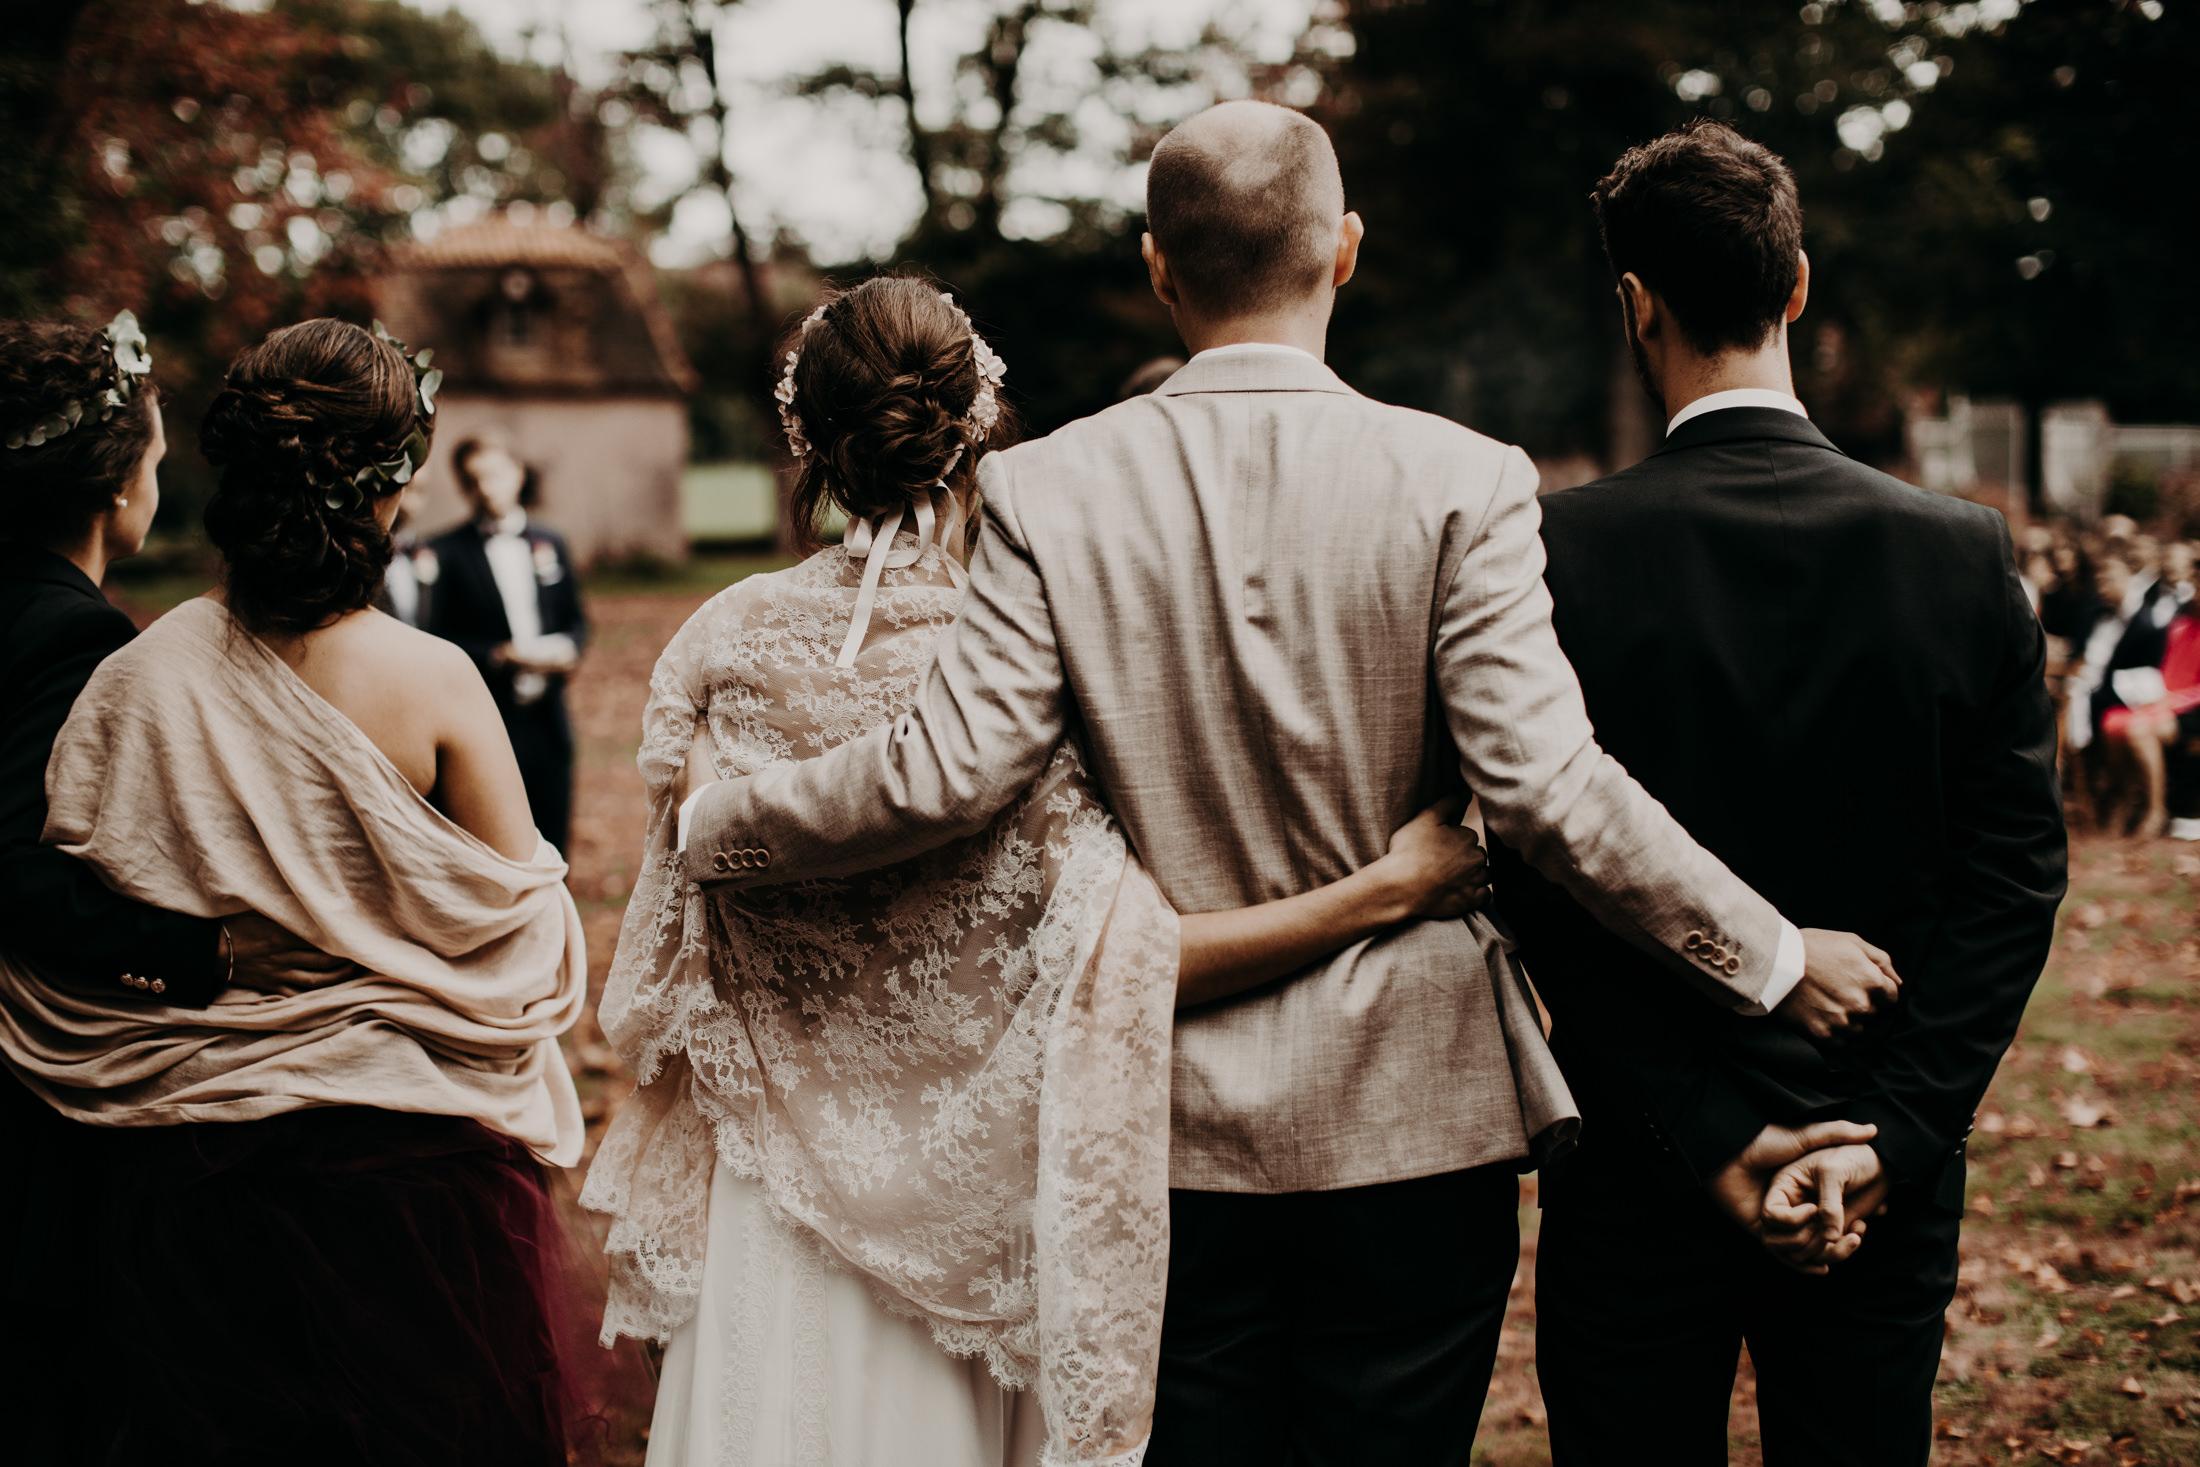 Mariage auvergne photographe wedding_-75.jpg